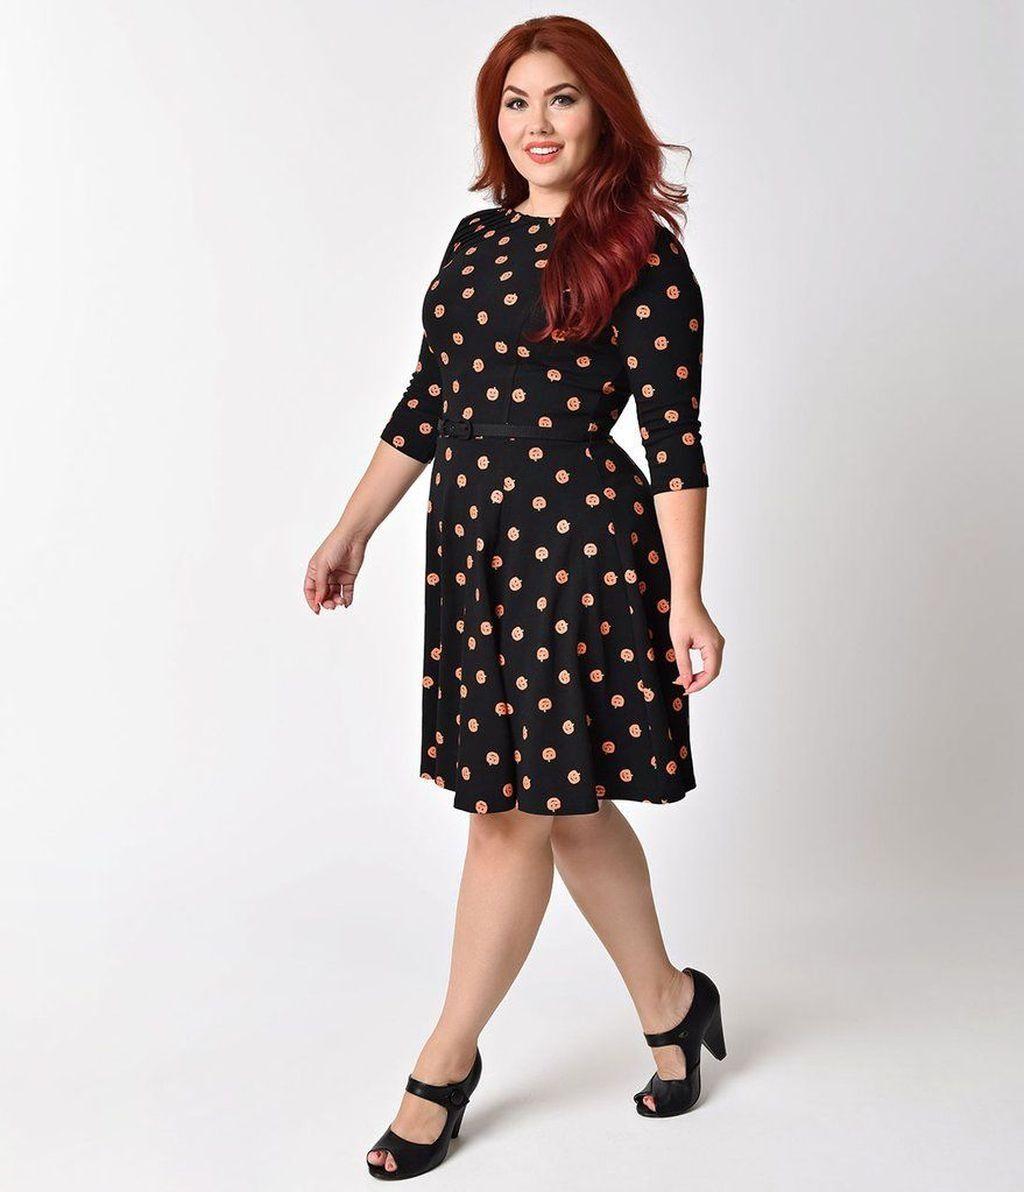 Plus Size Vintage Inspired Dresses